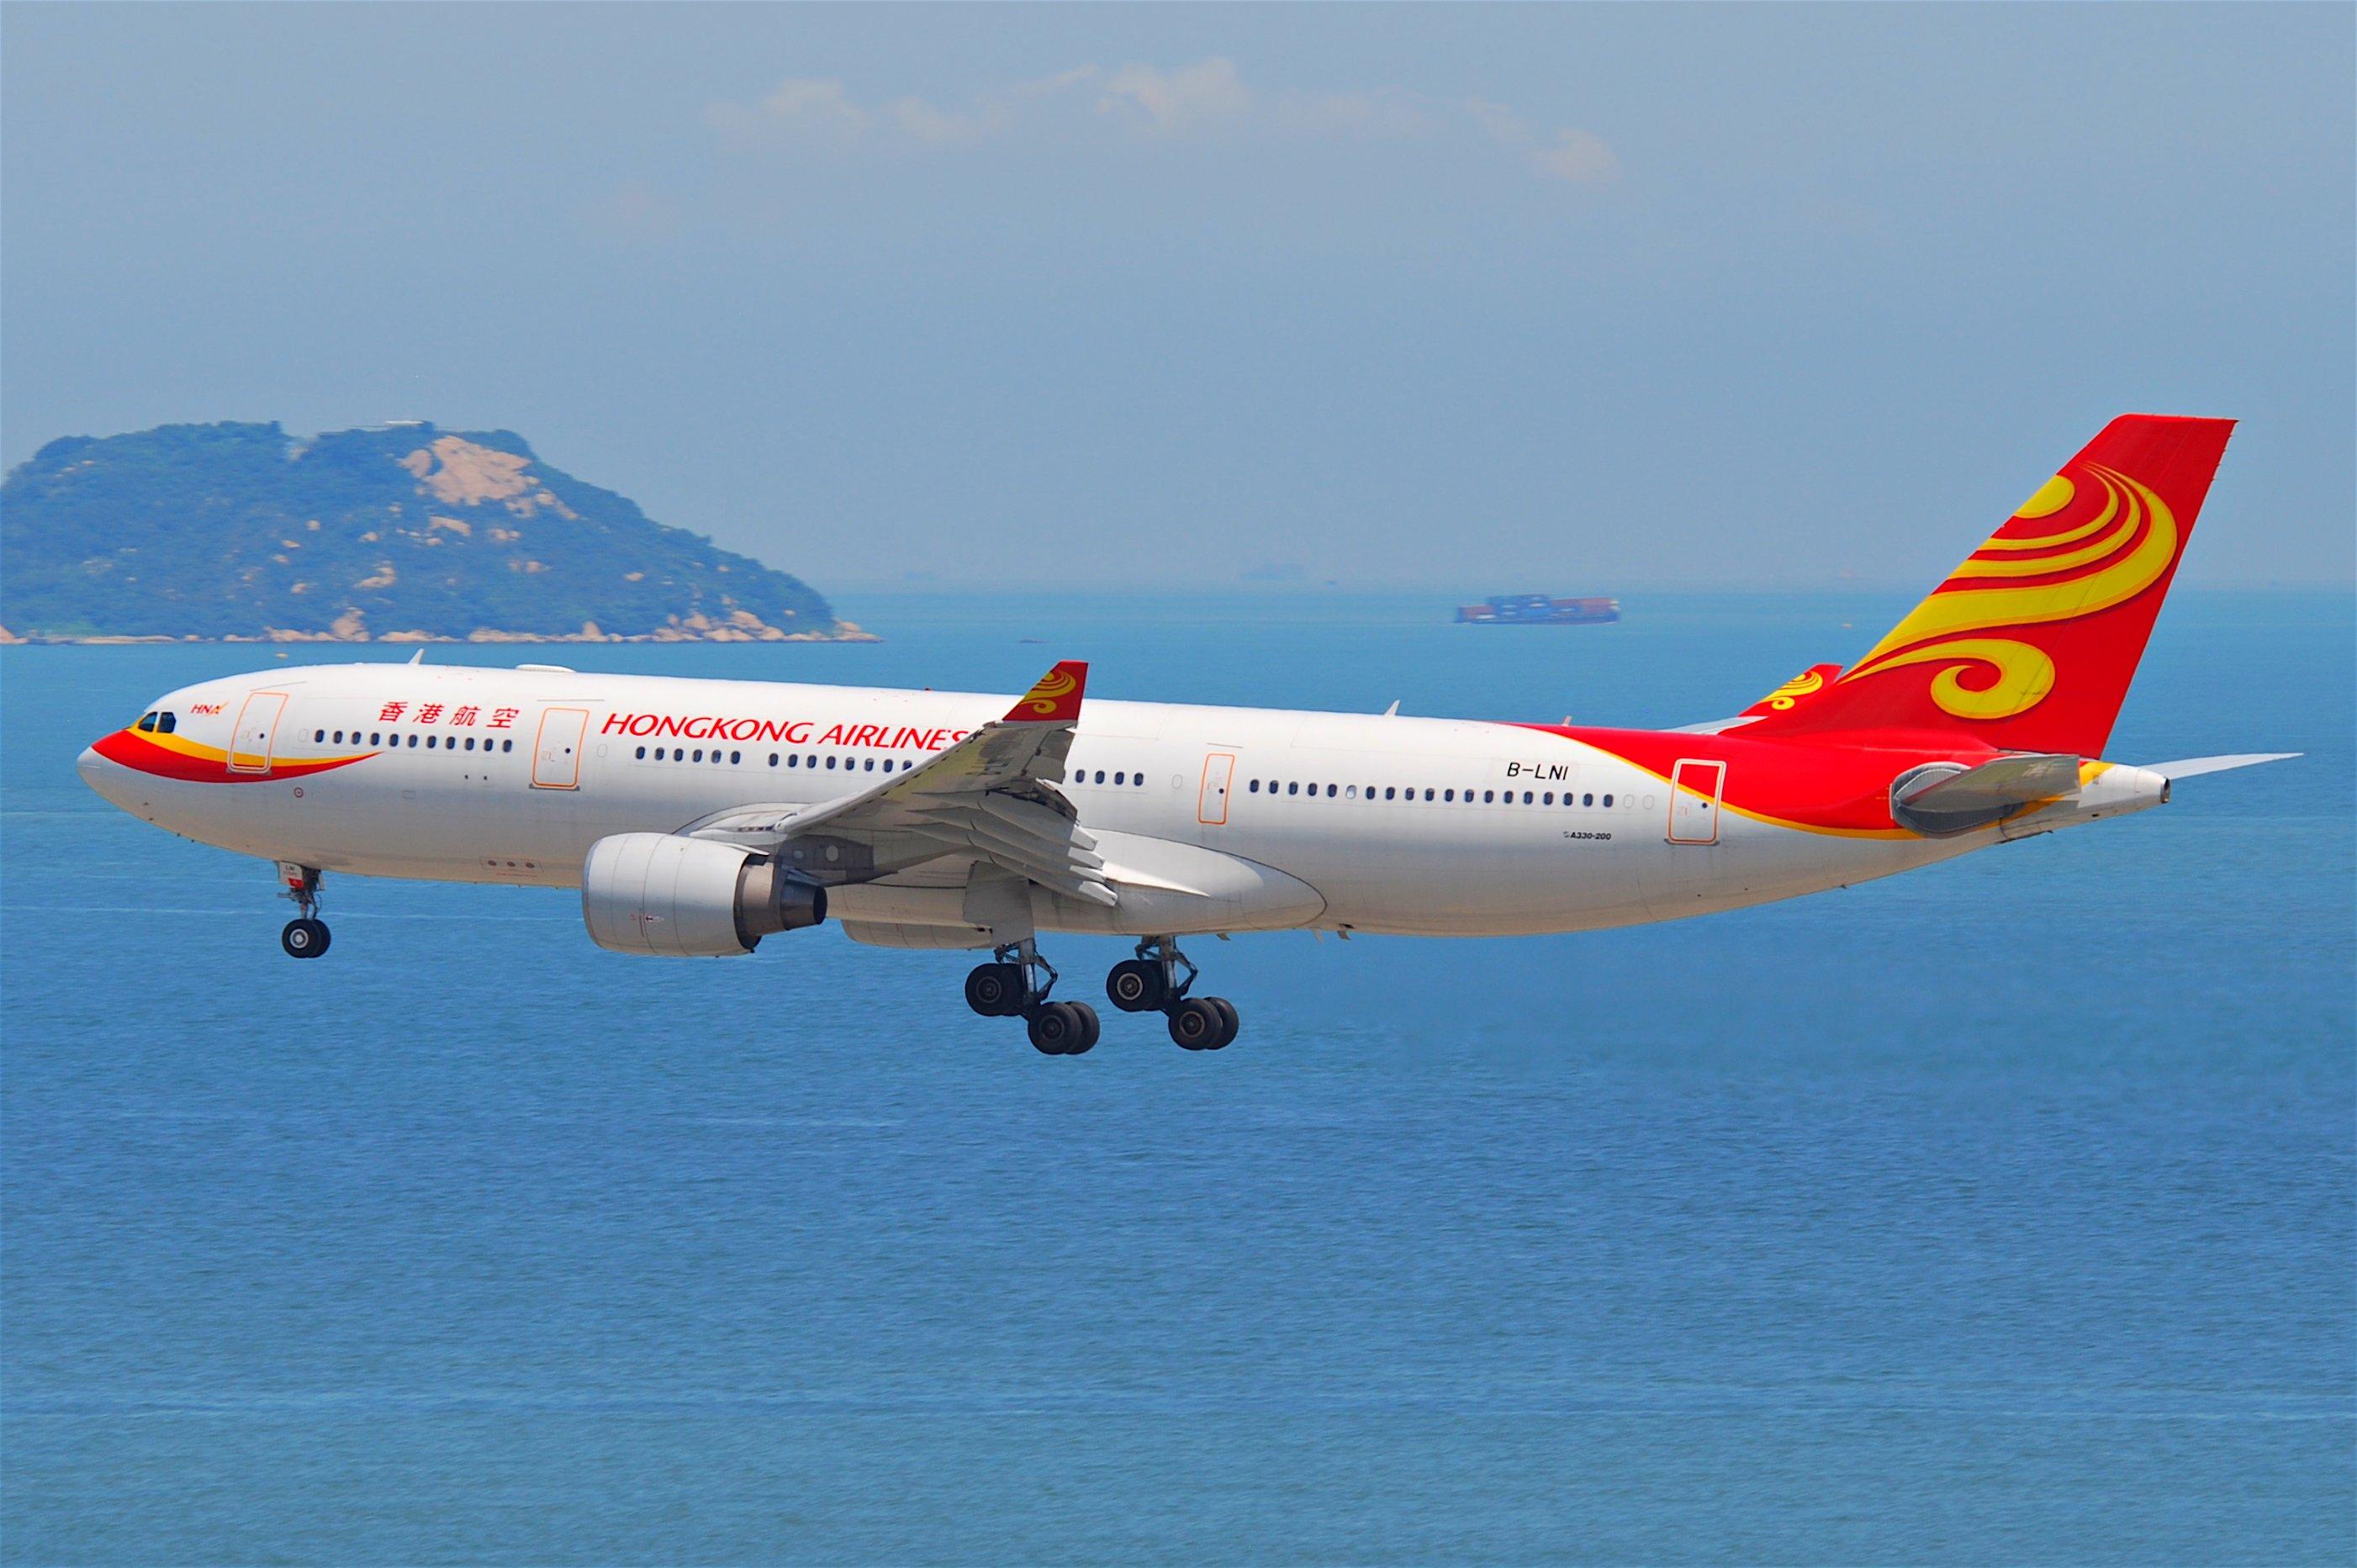 Fsx Wallpaper Hd File Hongkong Airlines Airbus A330 200 B Lni Hkg 04 08